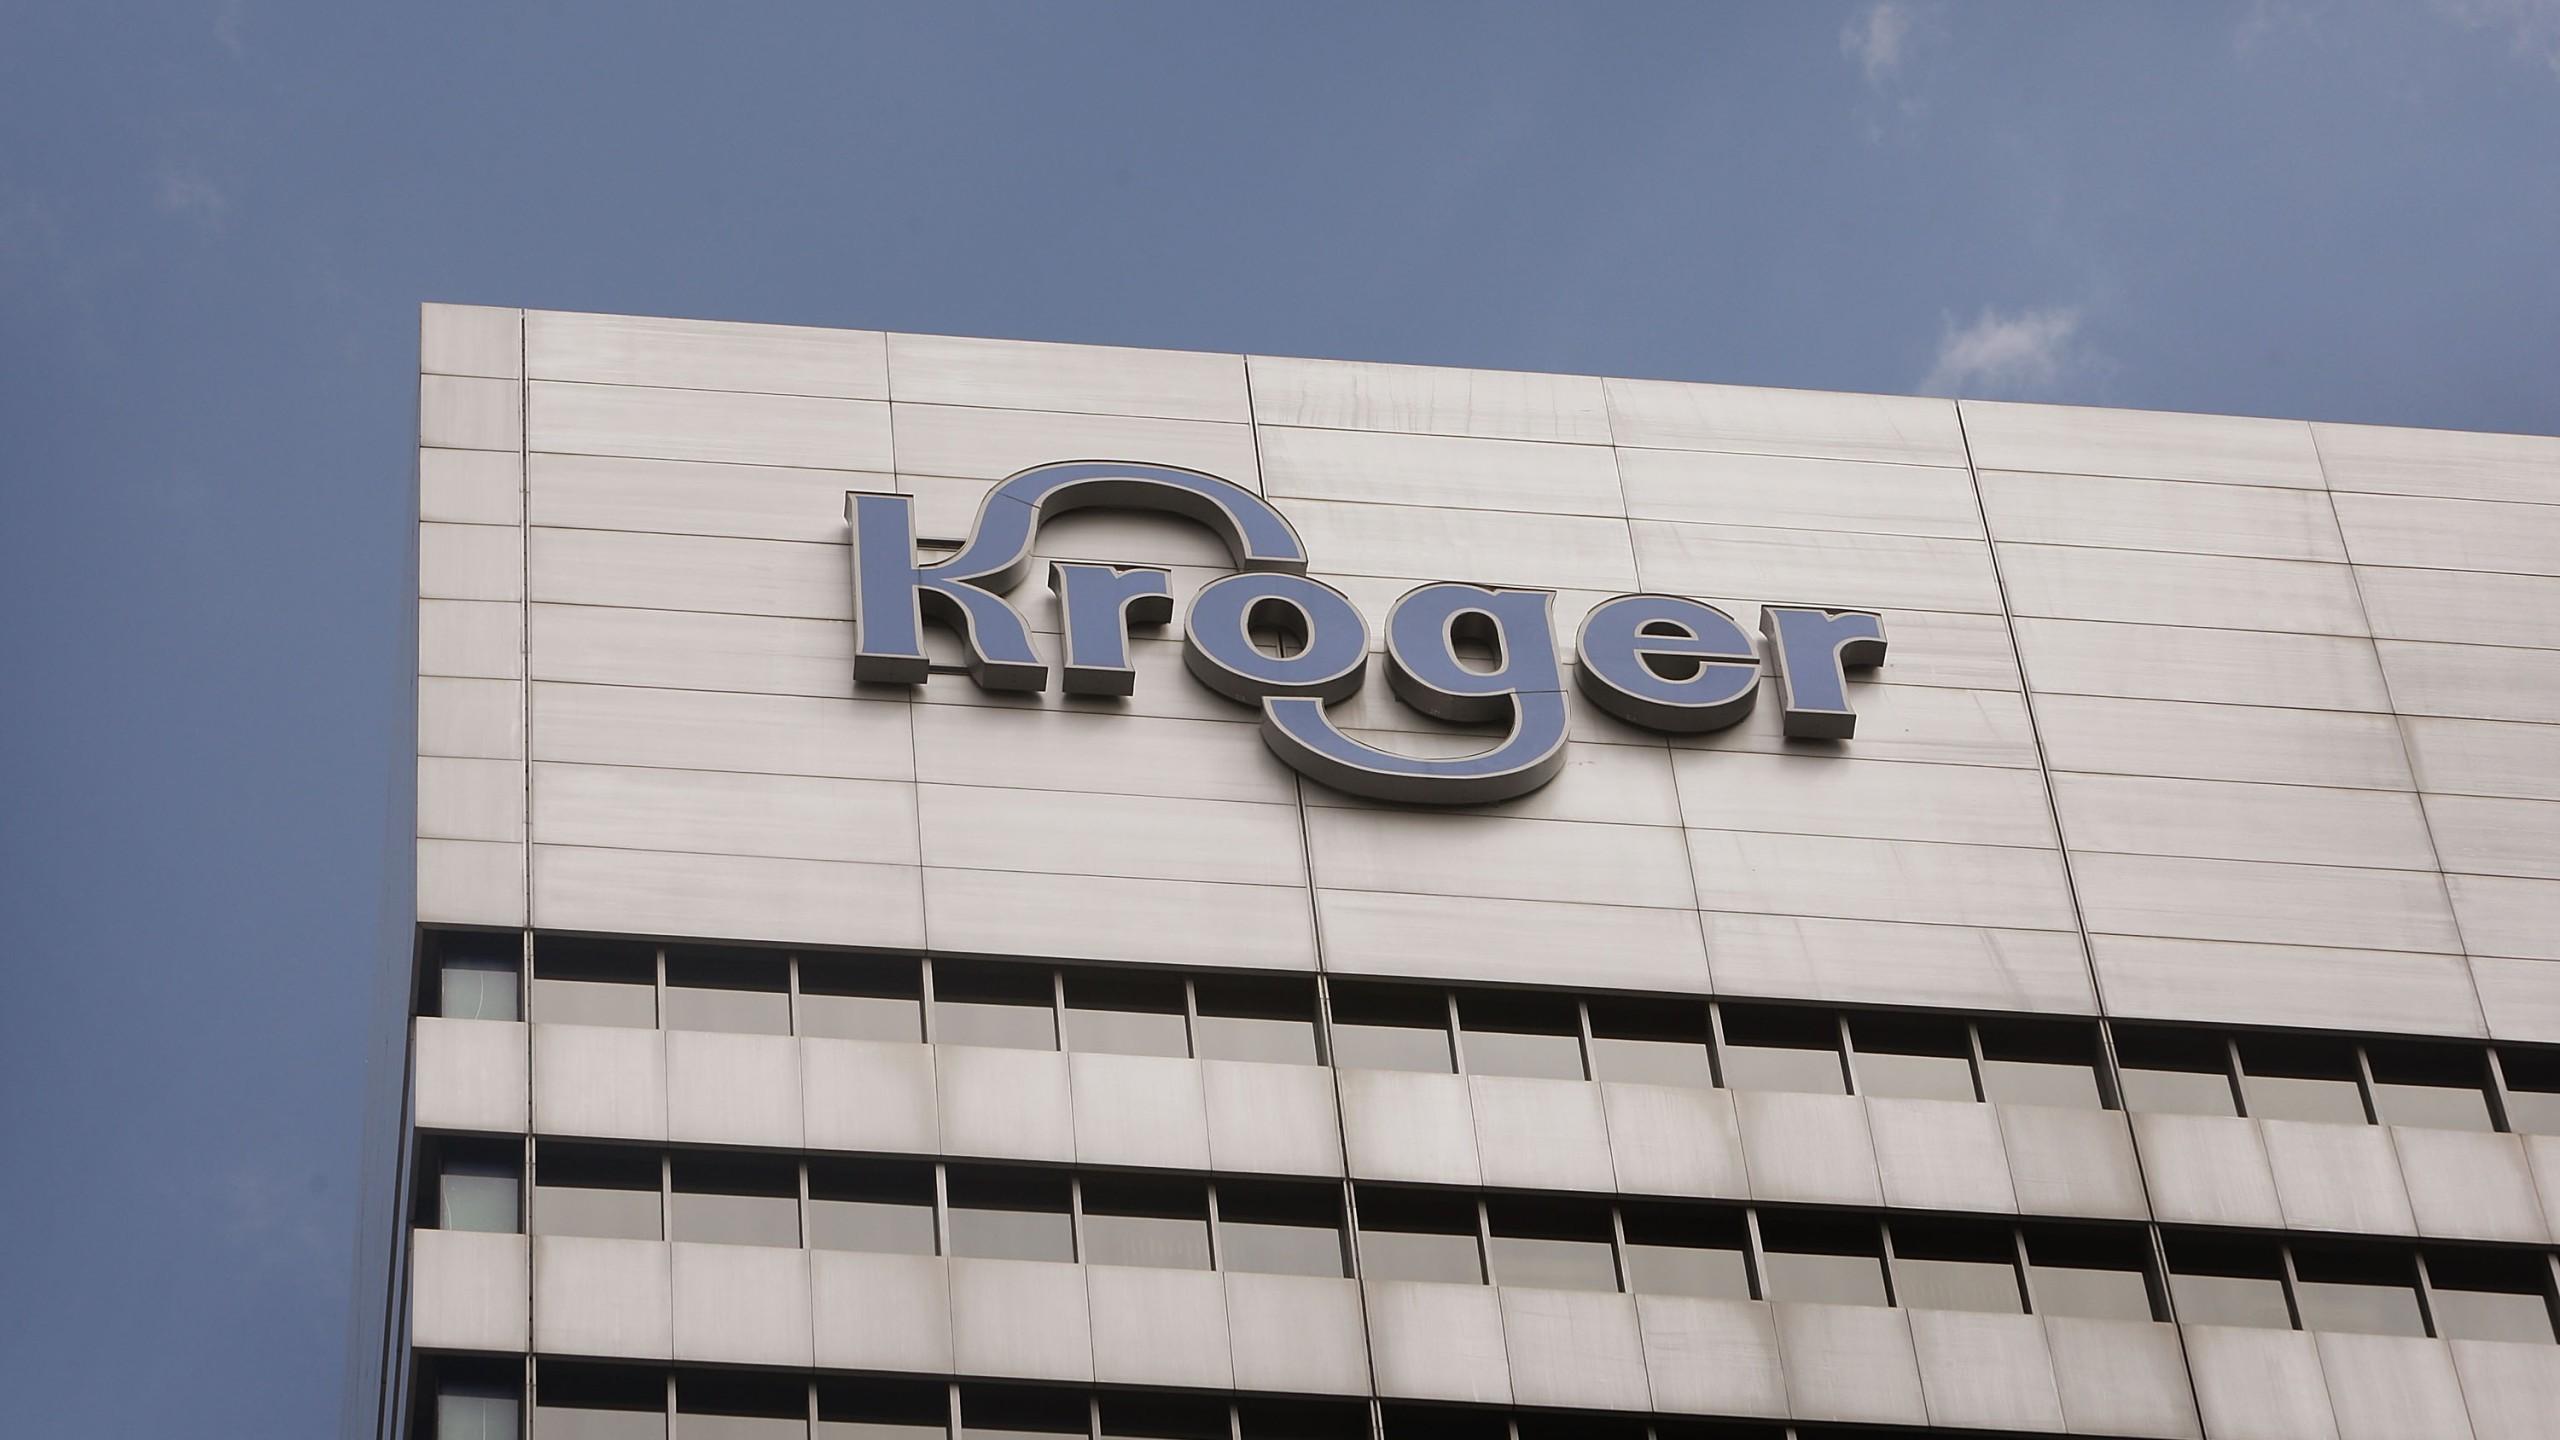 The Kroger Co. corporate headquarters is seen July 15, 2008, in downtown Cincinnati, Ohio. (Credit: Scott Olson/Getty Images)